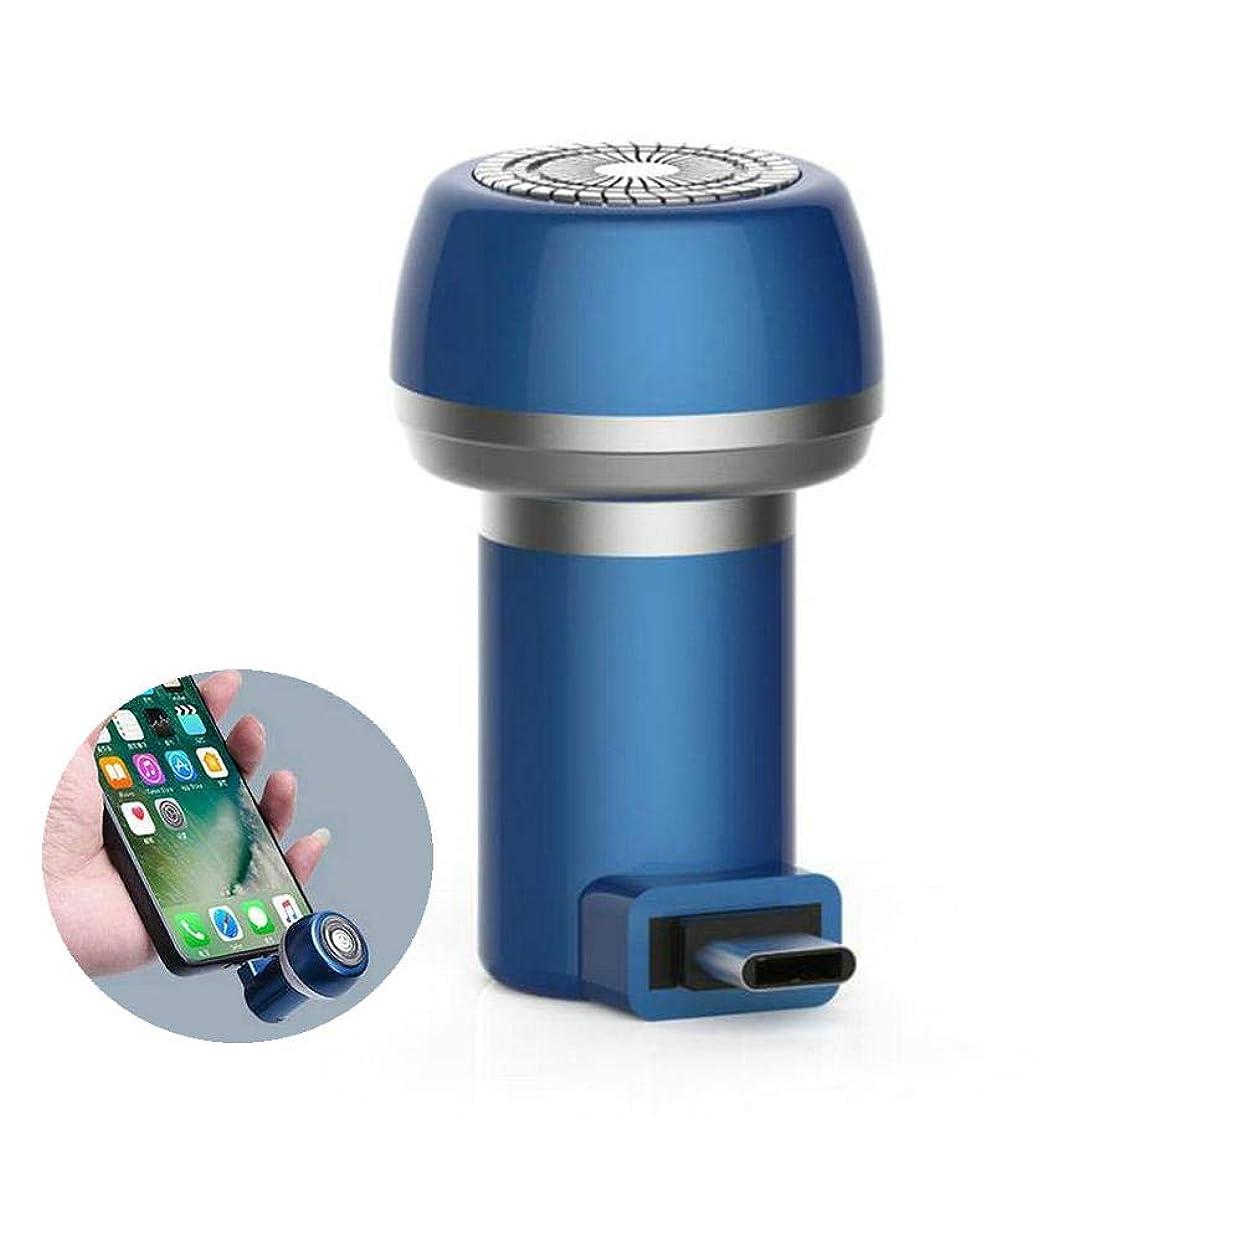 応答経験者時計XAHWL ミニ シェーバー 携帯電話 Micro/Type-c/USB+Micro 脱毛器